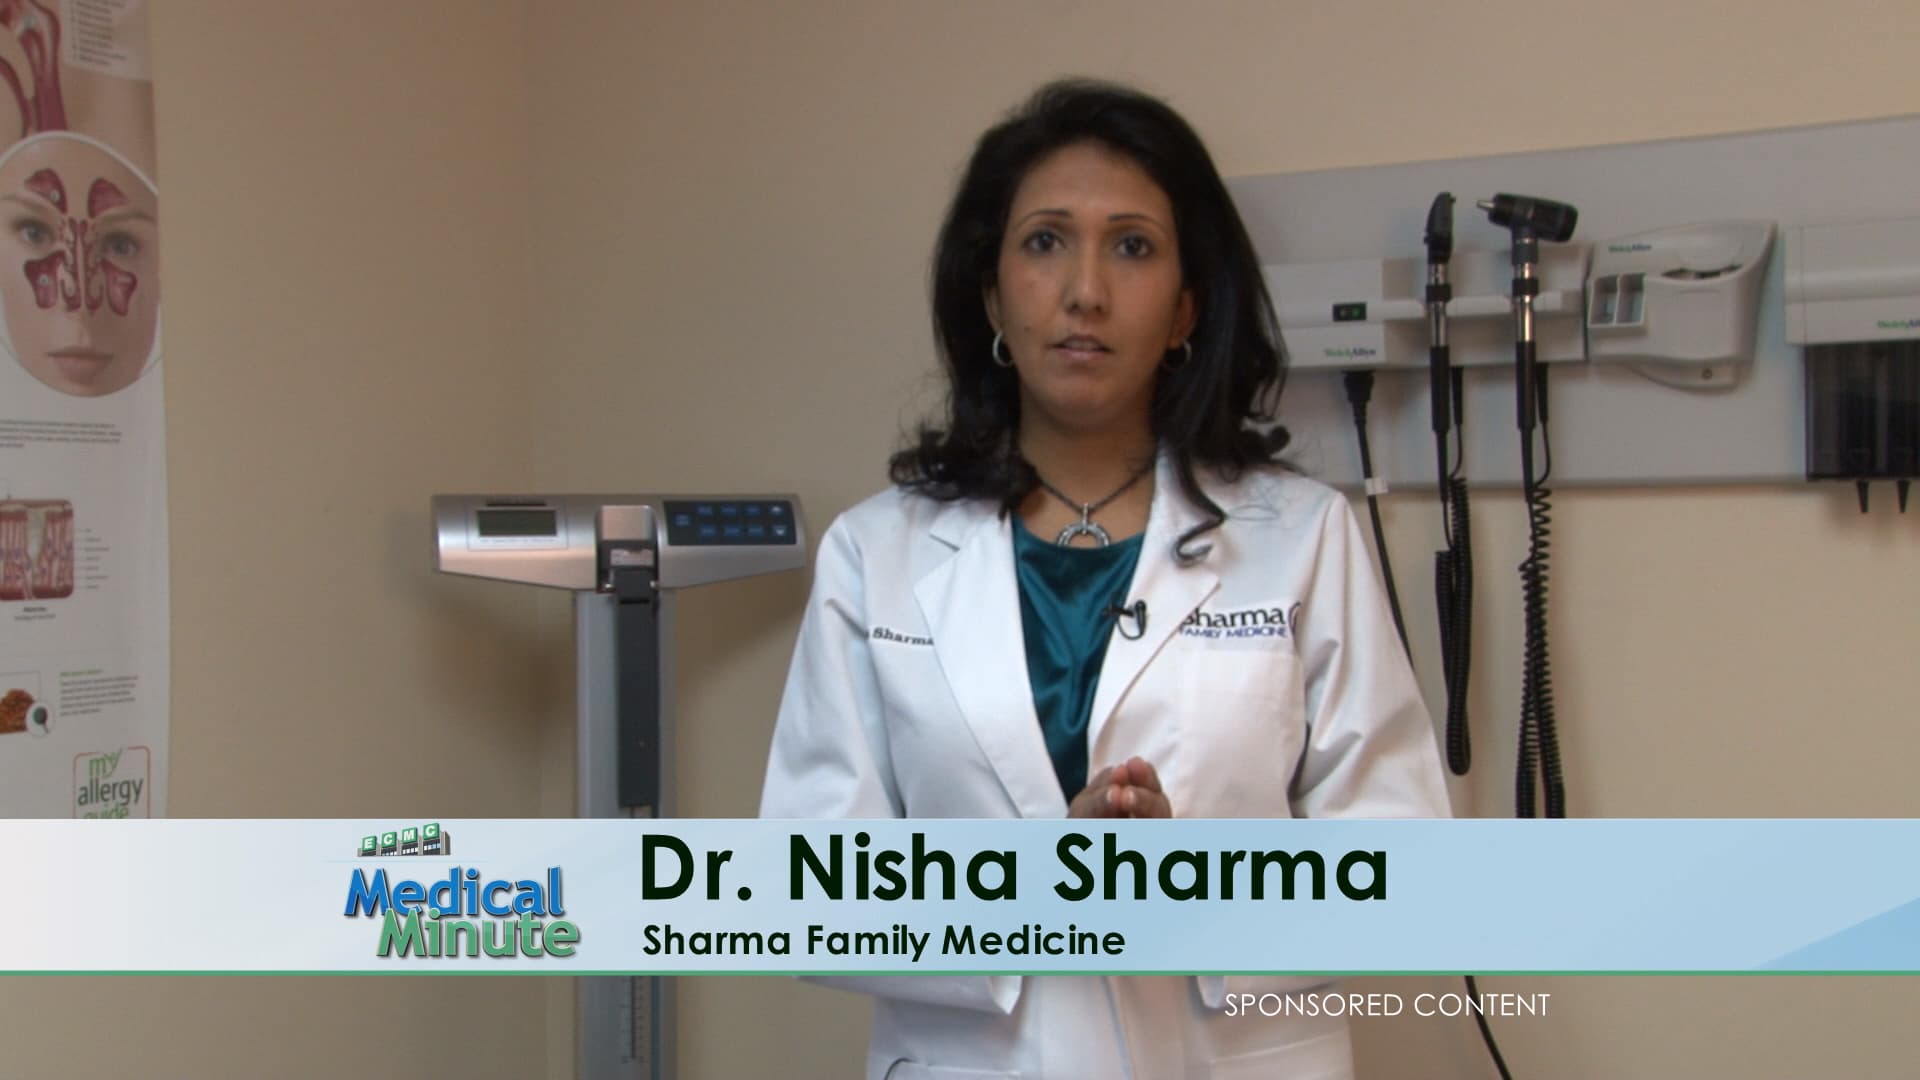 ECMCMedicalMinute-Dr.NishaSharma-ShouldIGetAFluShot-100118-STILL